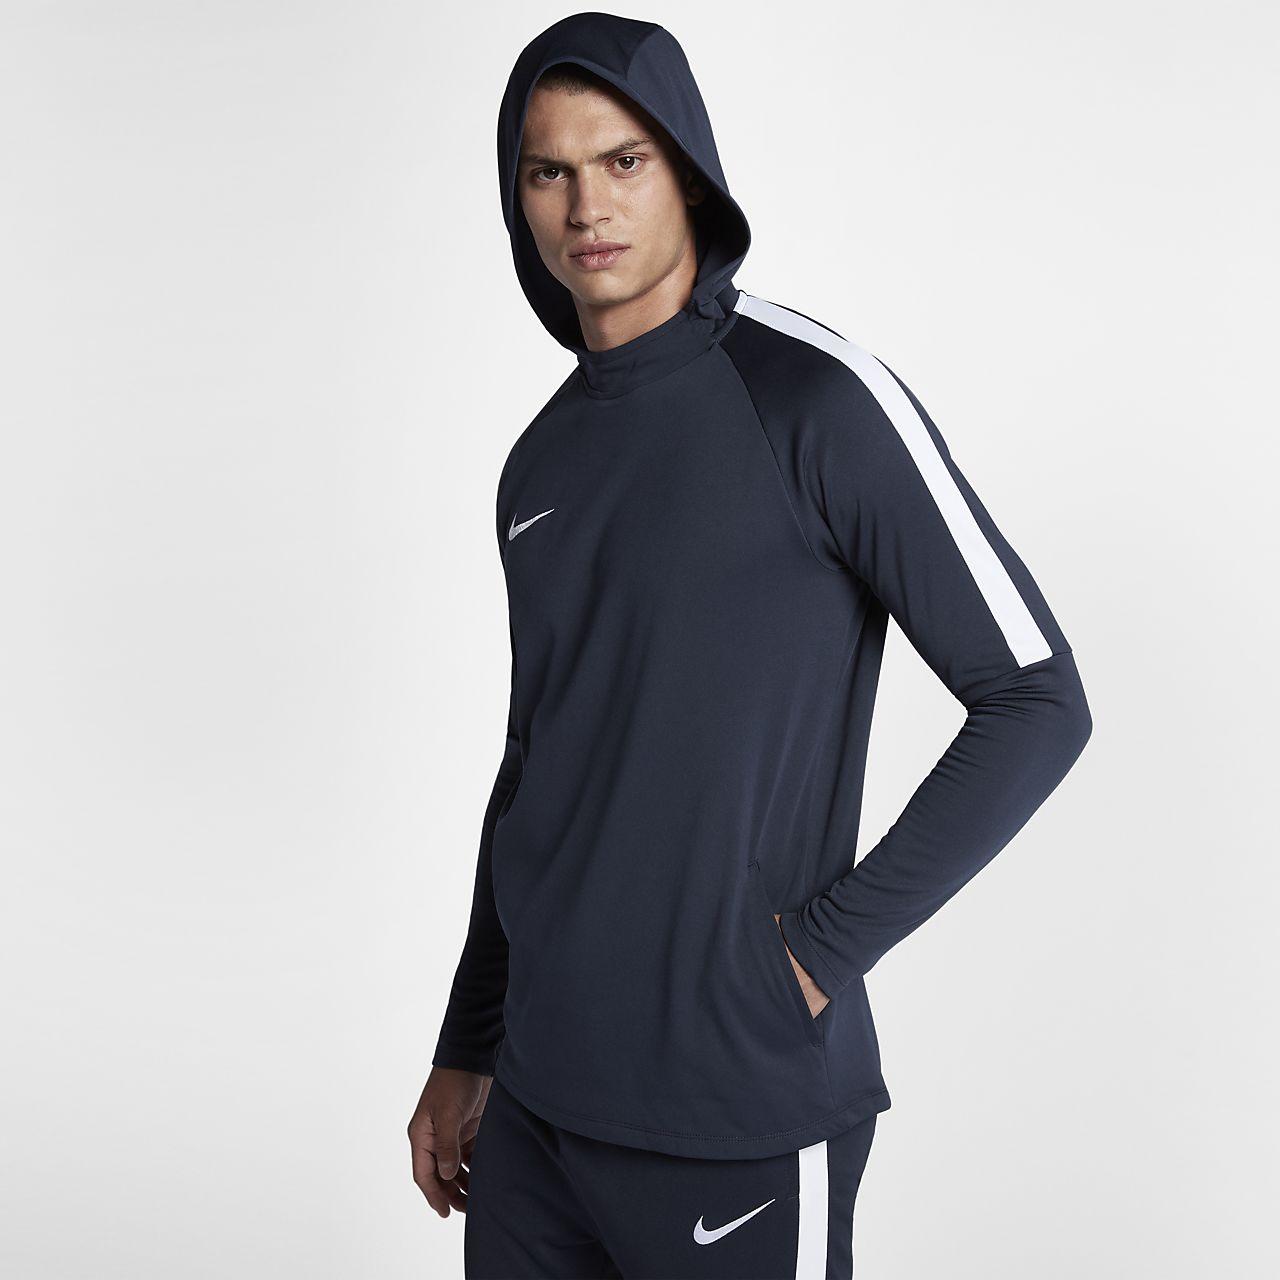 6adbefd9e4200 Nike Dri-FIT Academy Men s Pullover Football Hoodie. Nike.com HU